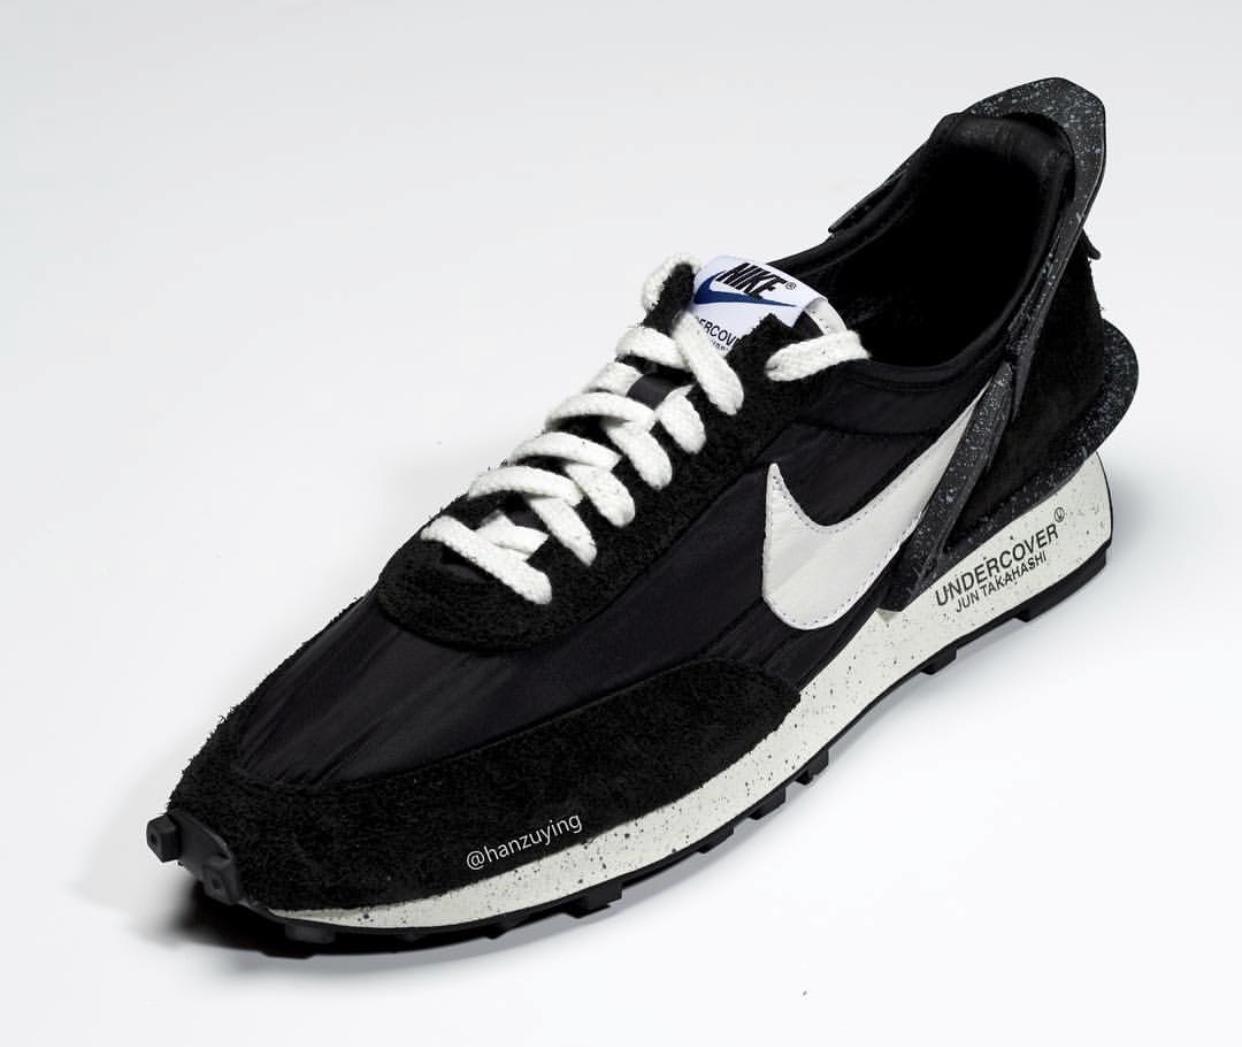 Undercover Nike Daybreak Black White BV4594-001 Release Date